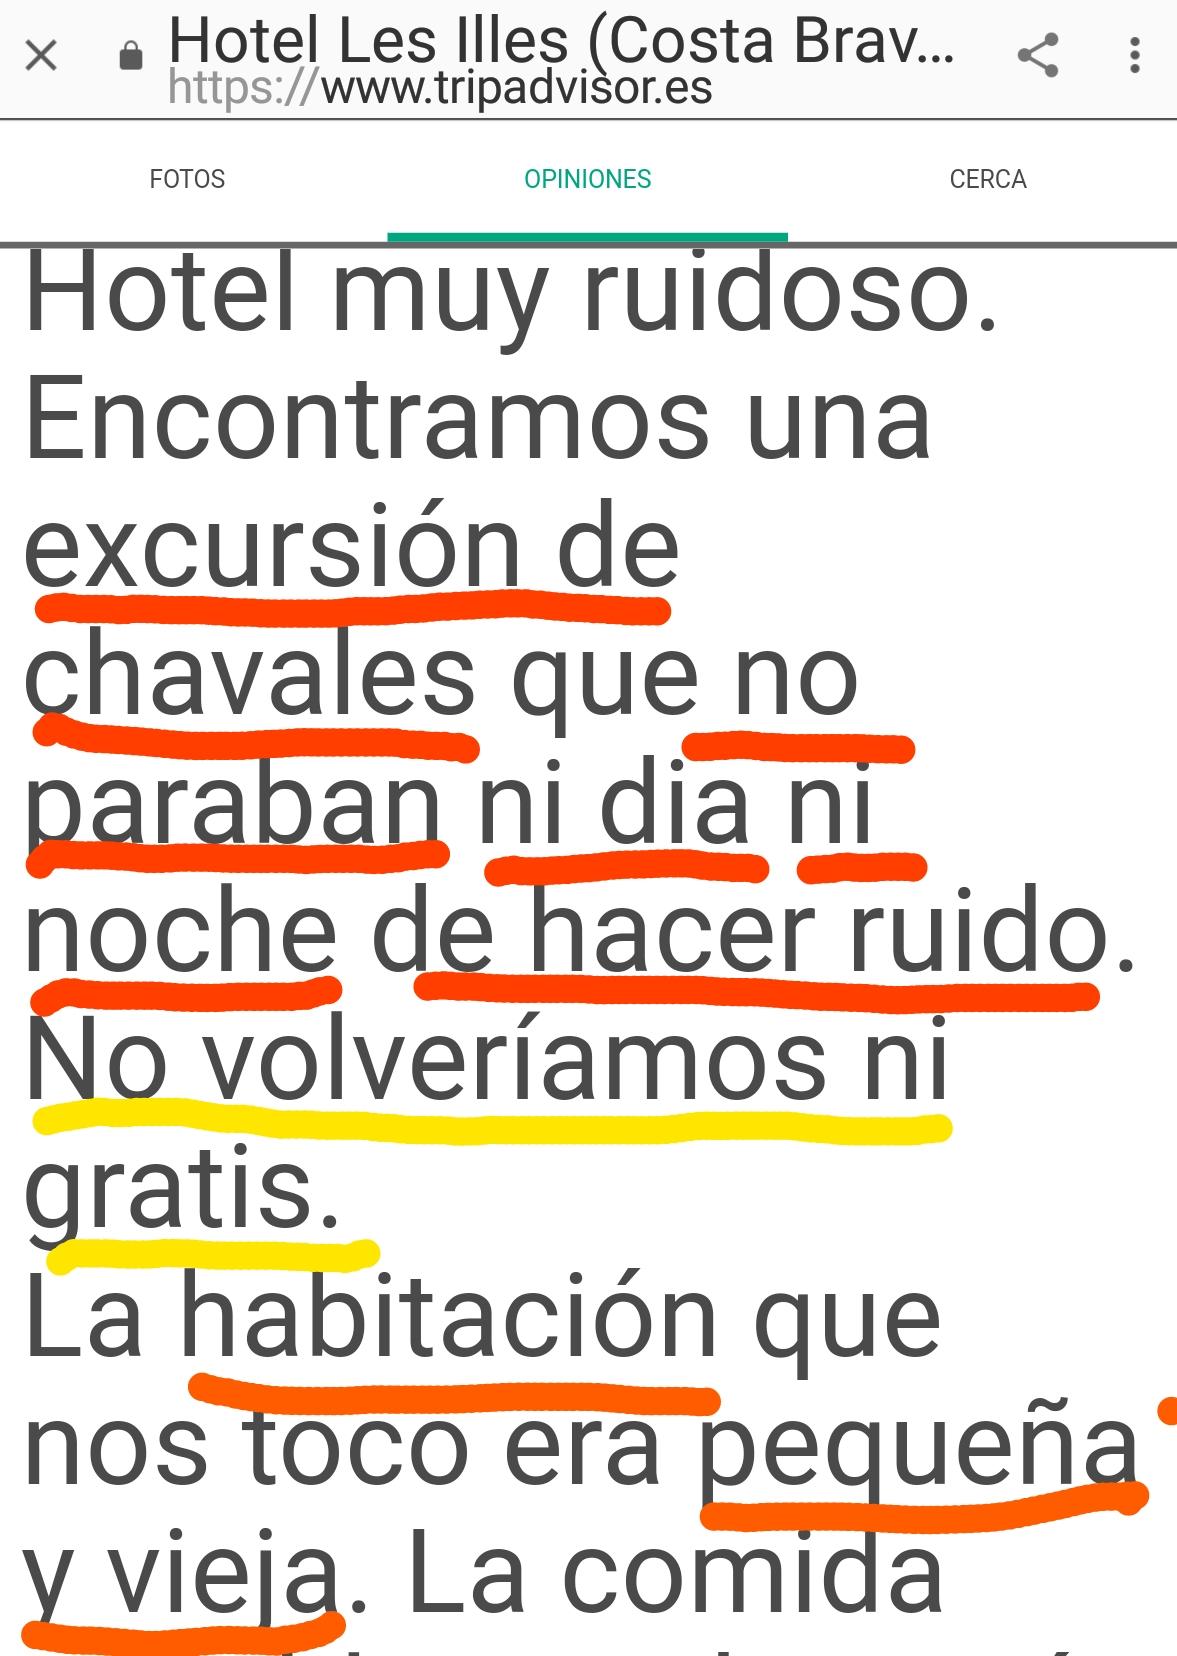 Hotel les illes infiwrno Estartit